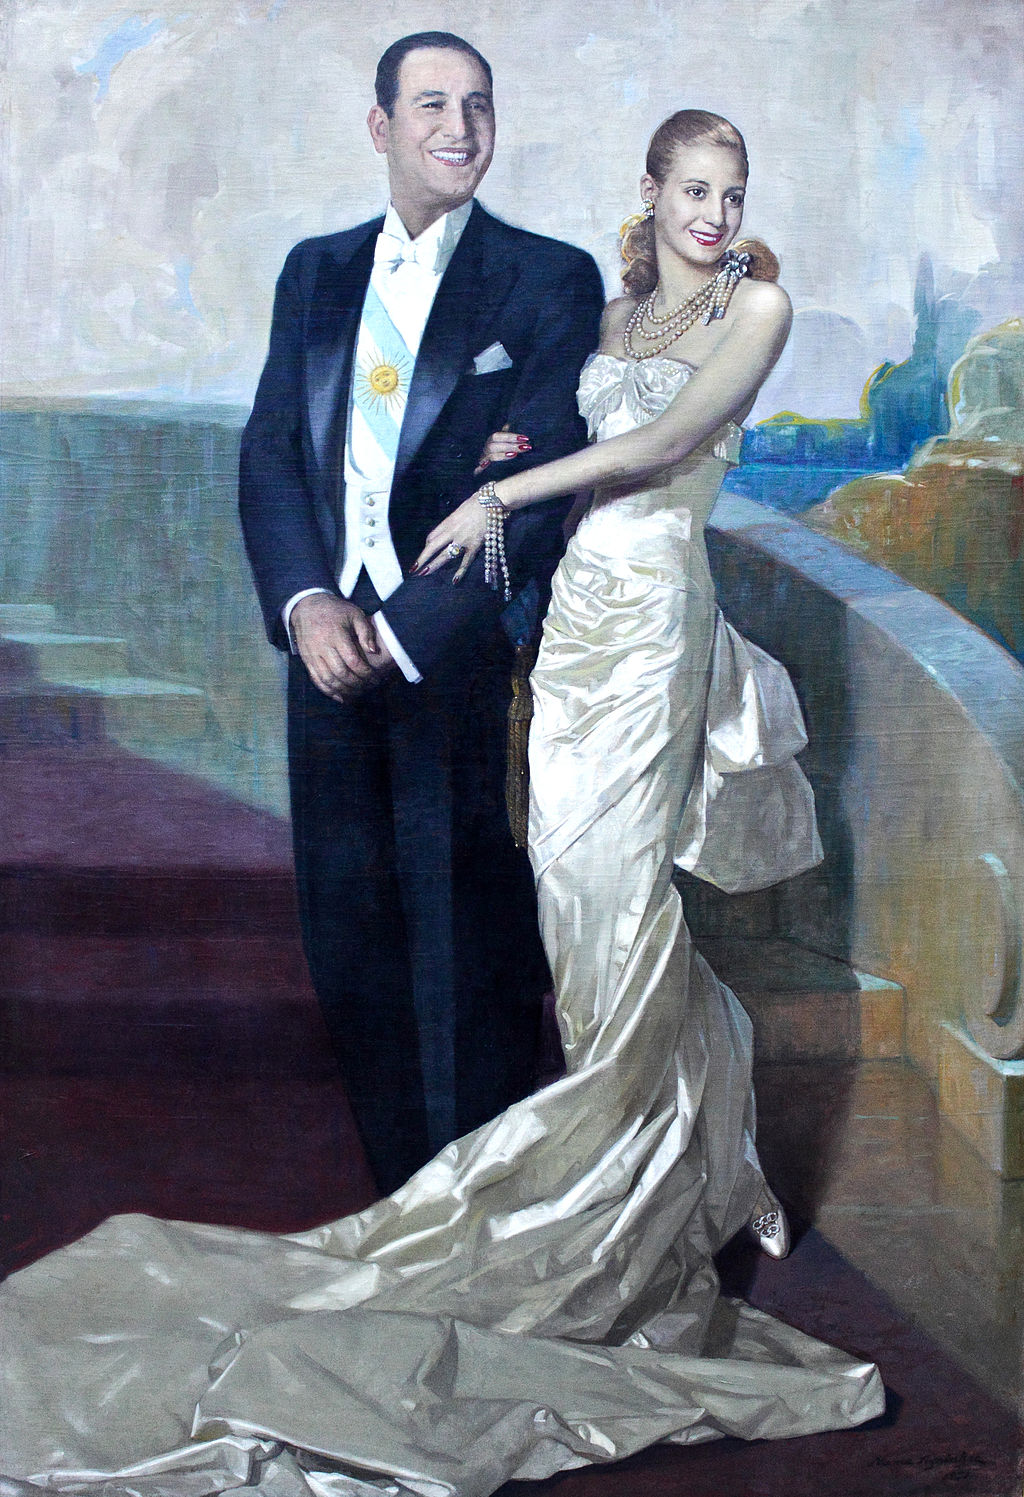 Portrait of Juan Domingo Perón and Eva Peron by artist Numa Ayrinhac